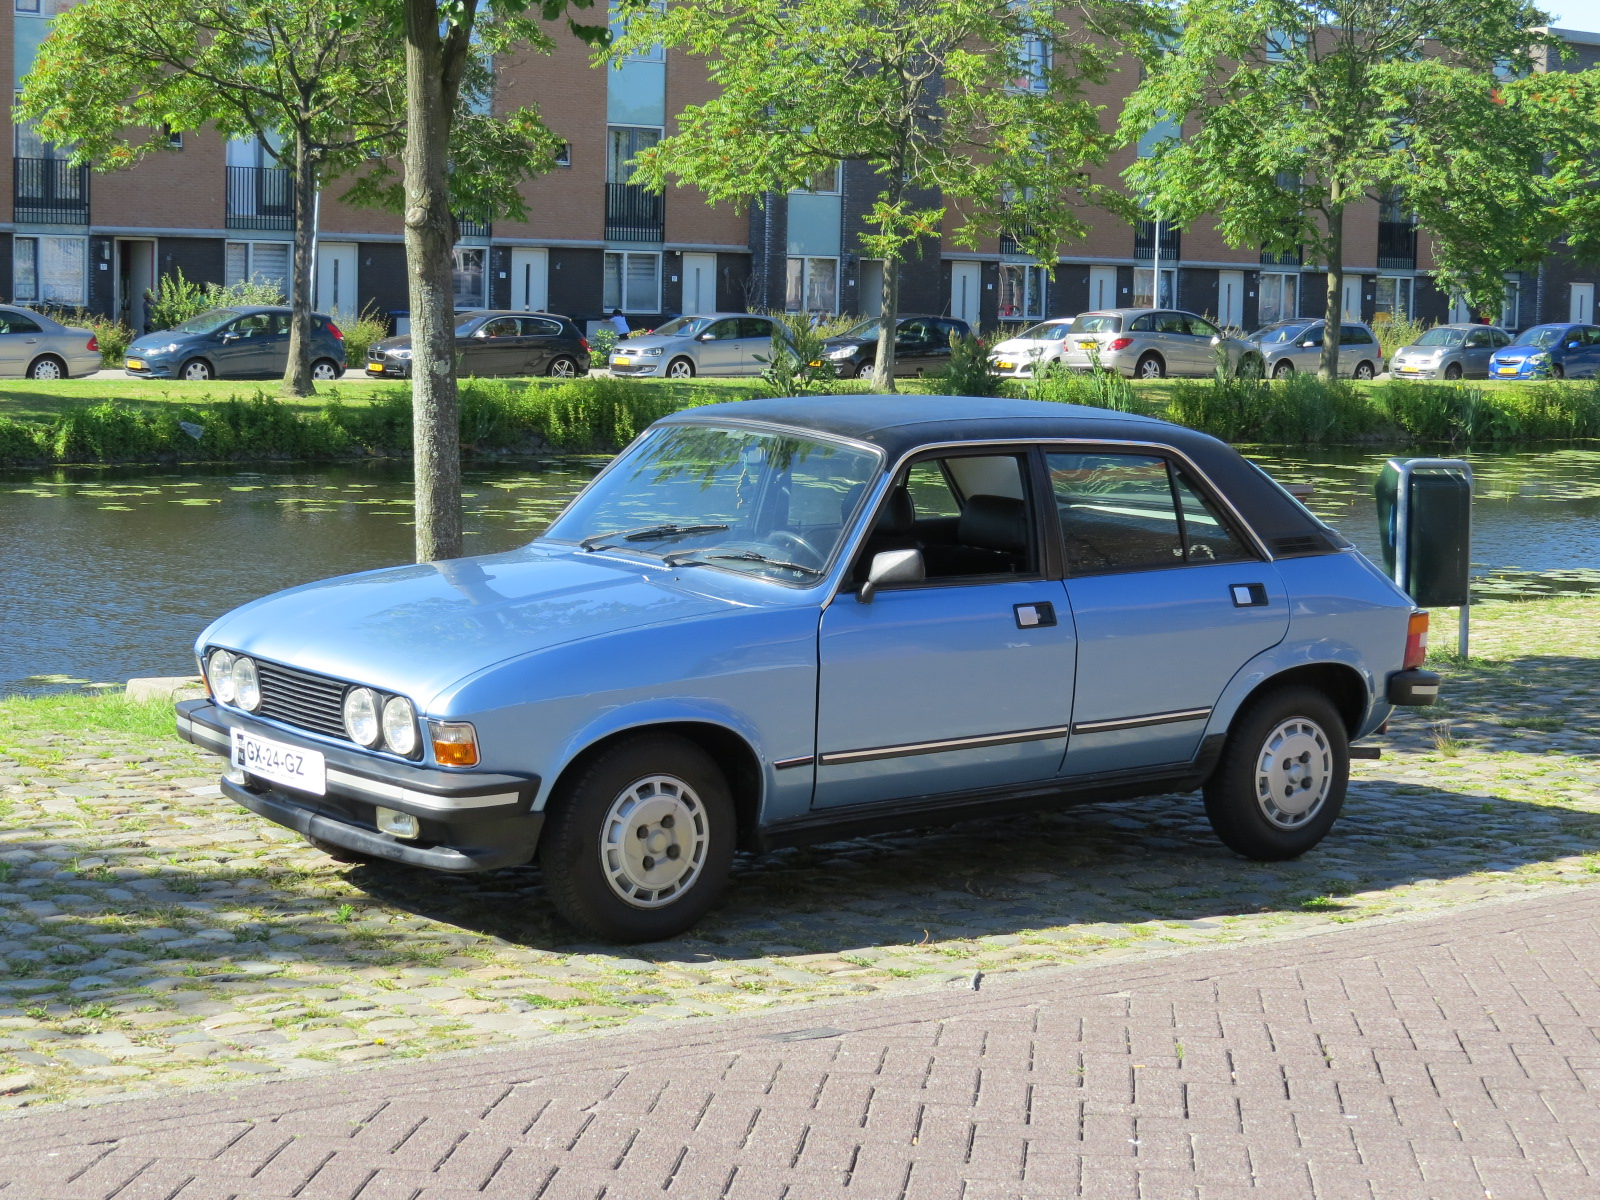 Austin Allegro 3 1981 Sprzedany Gielda Klasykow